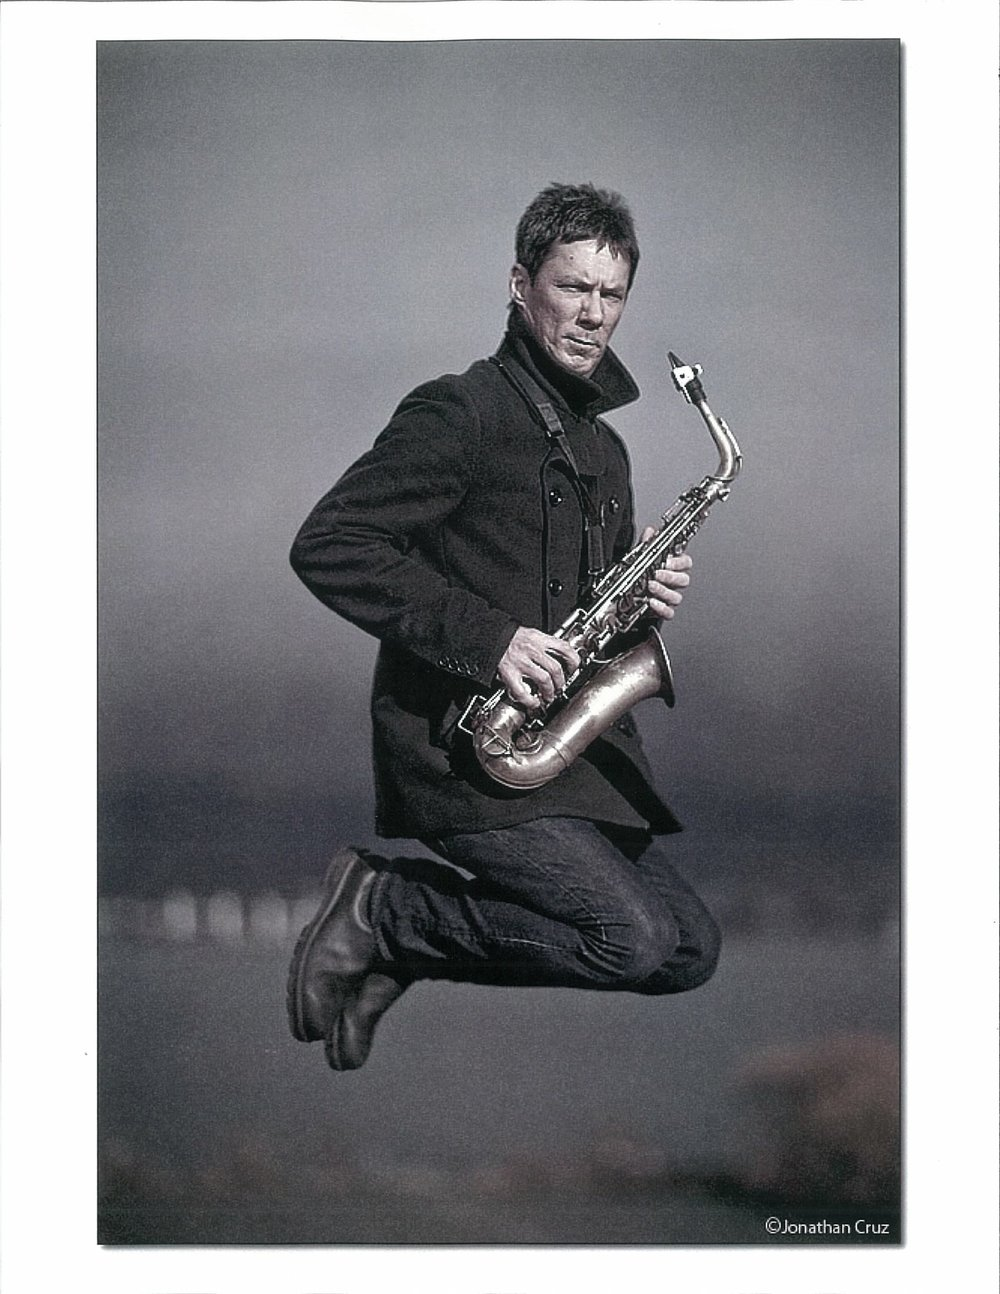 Dylan Cramer (Jonathan Cruz Photo)